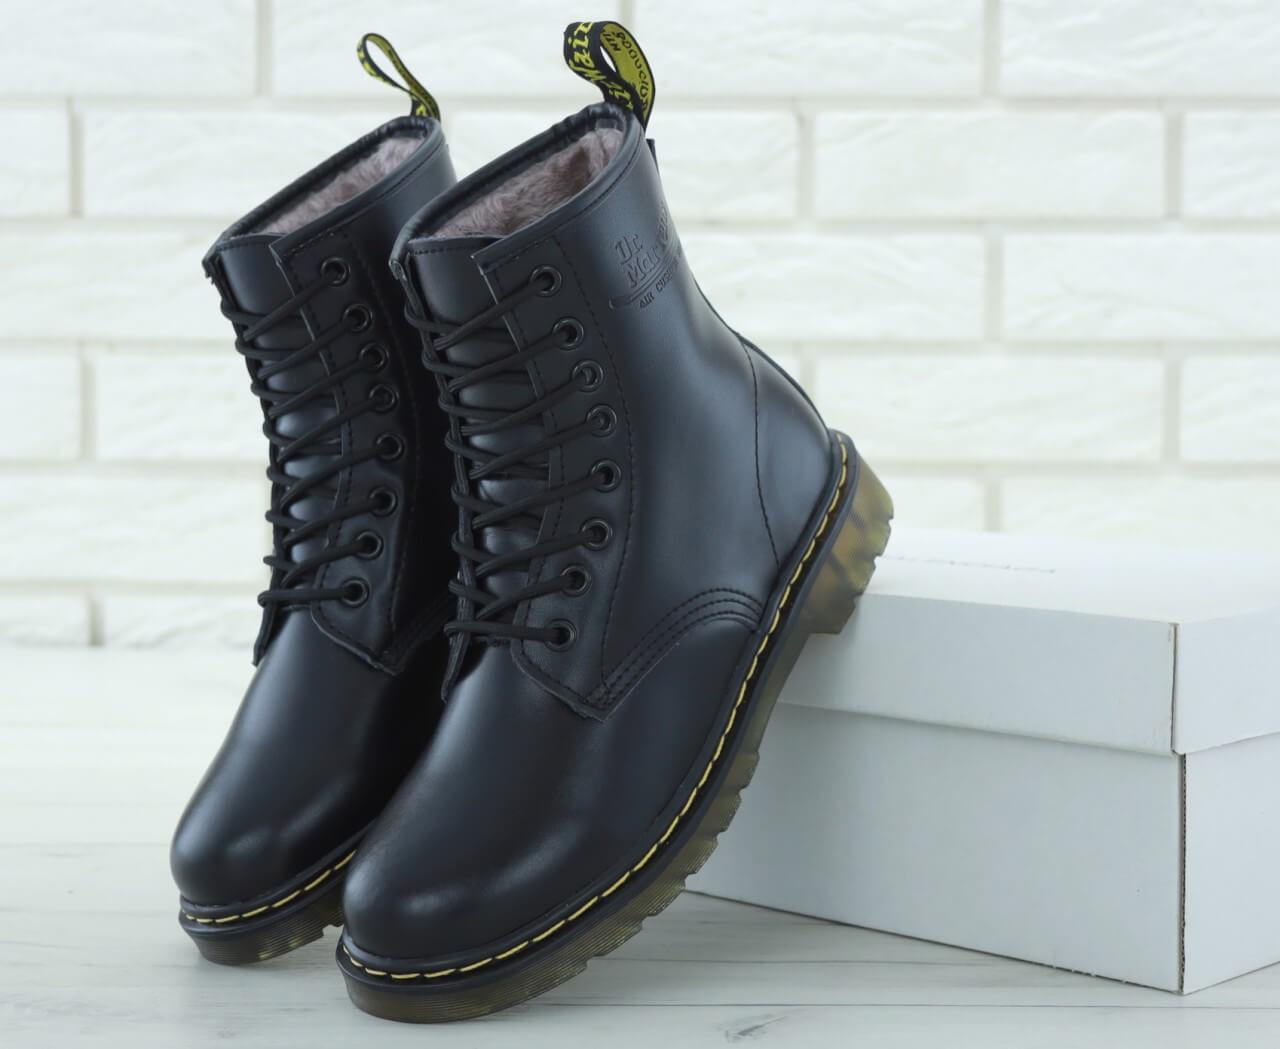 66a703c8d2f9 Женские ботинки Timberland Classic Boots белого цвета   Интернет ...